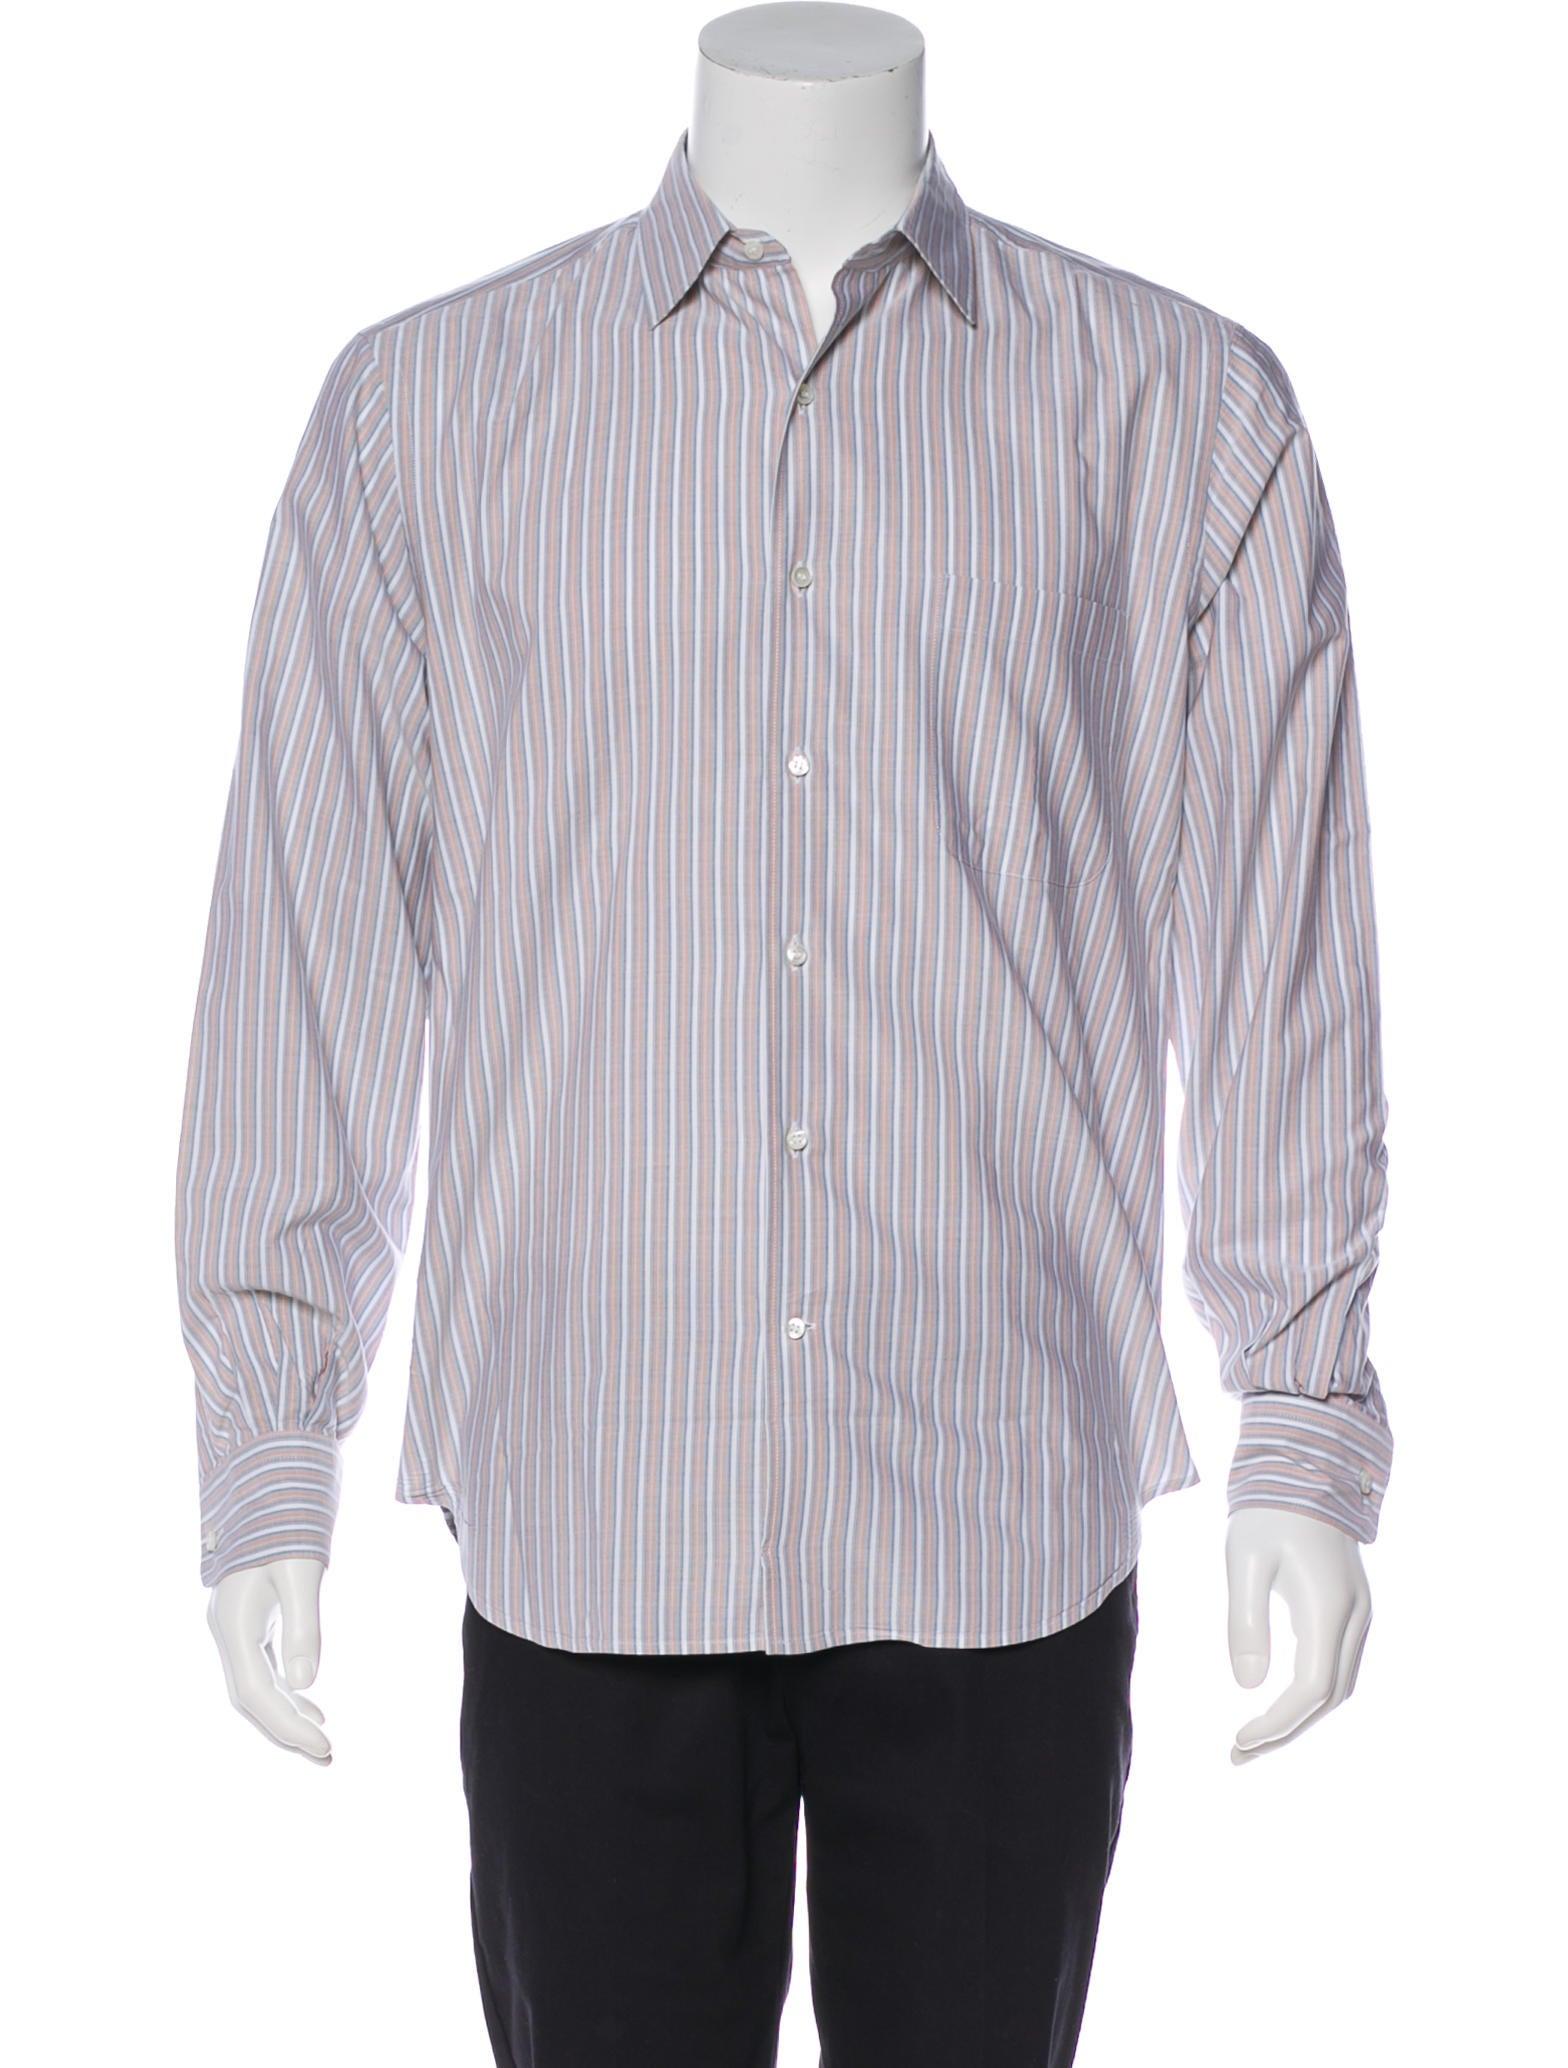 977ae00572f Orange And White Striped Dress Shirt - DREAMWORKS